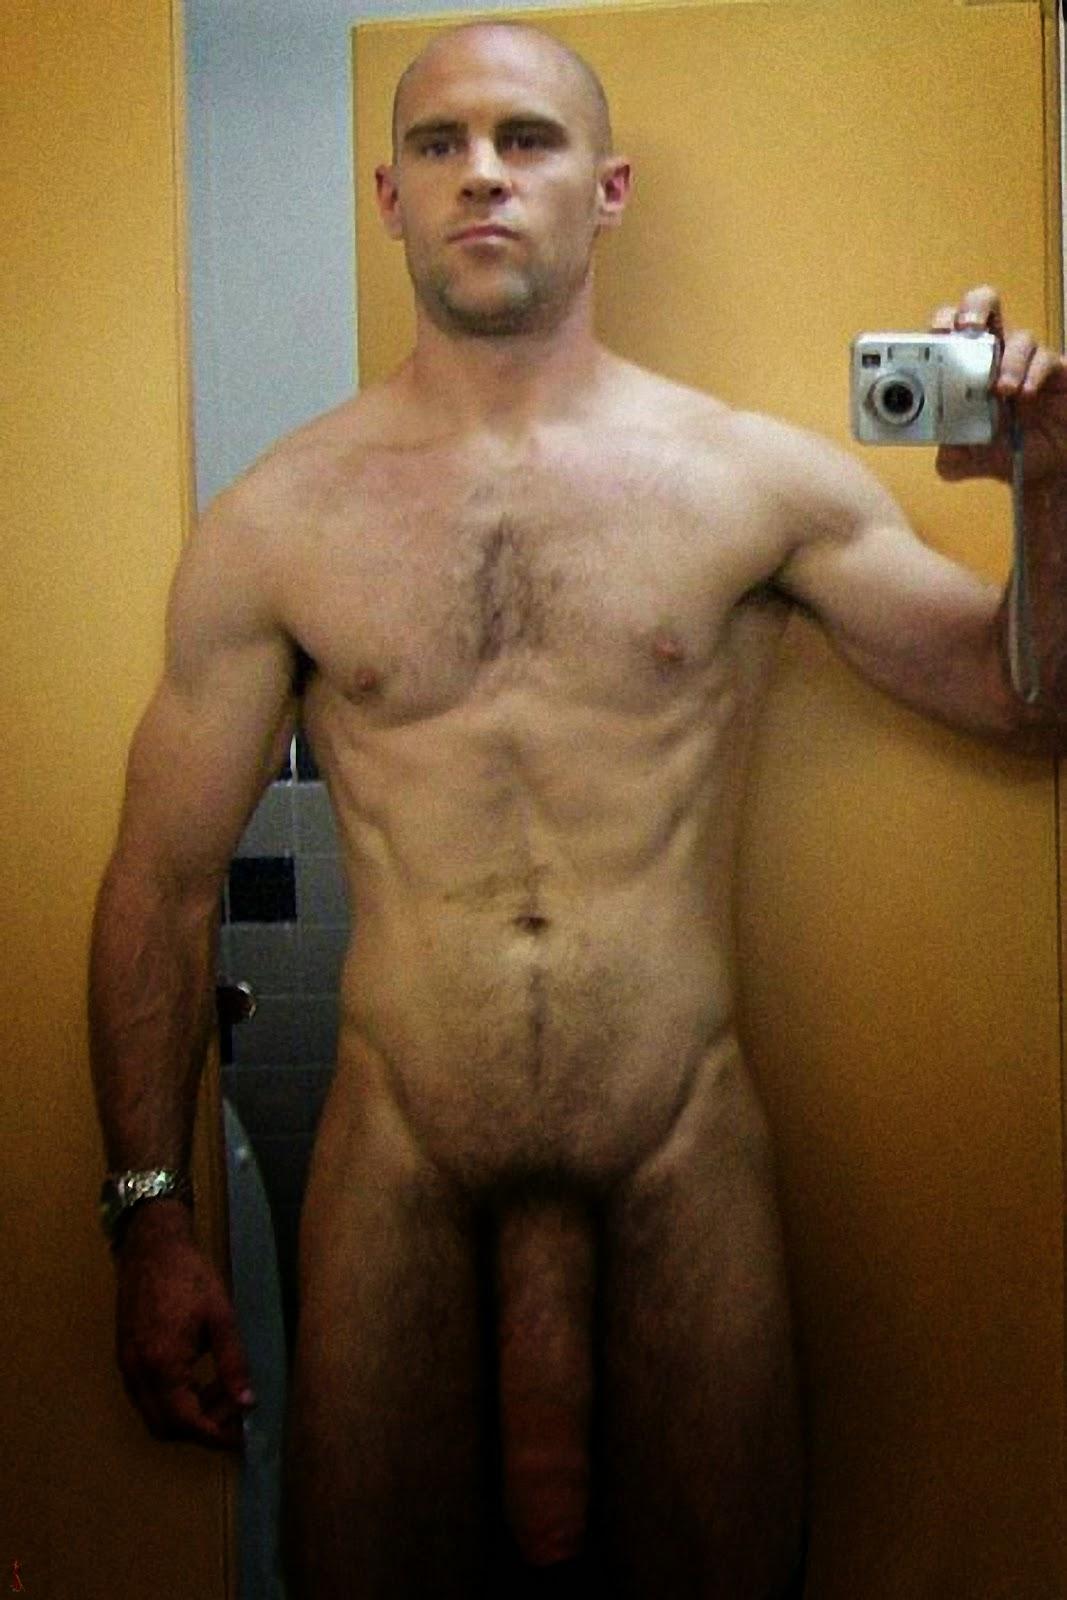 Guy has big dick